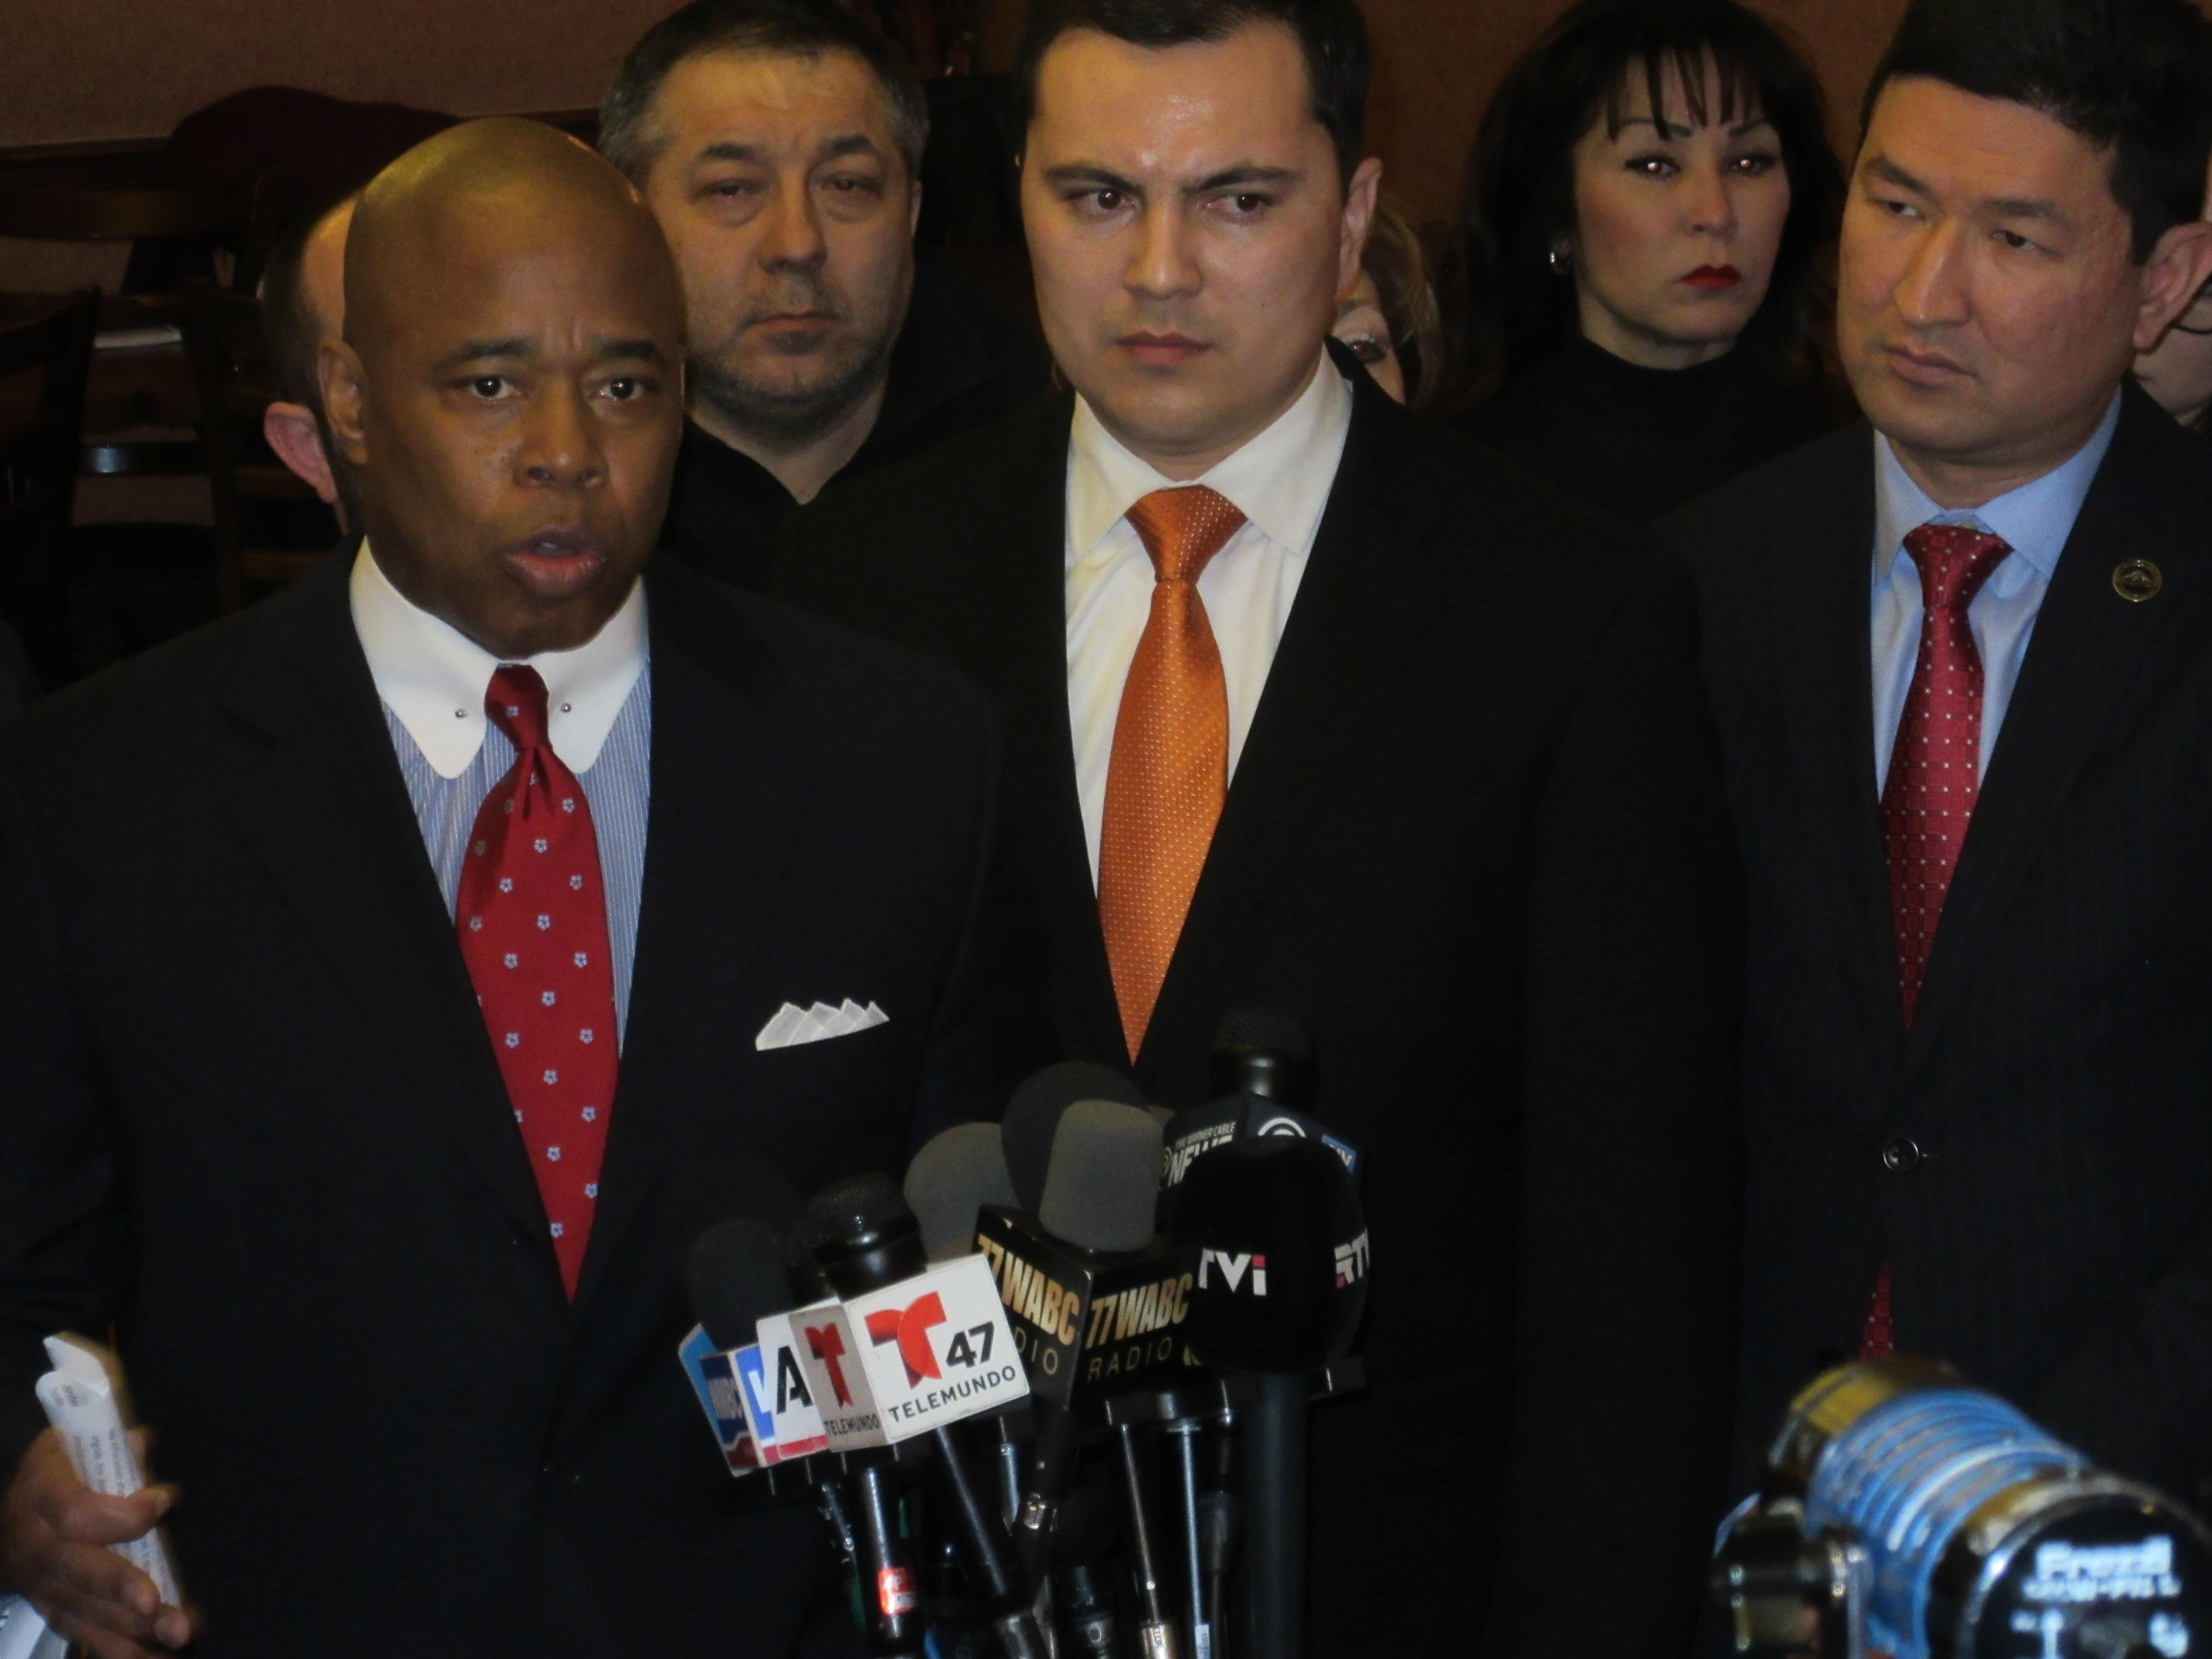 Brooklyn Borough President Eric Adams with Muslim community leaders (Photo: Will Bredderman/New York Observer).